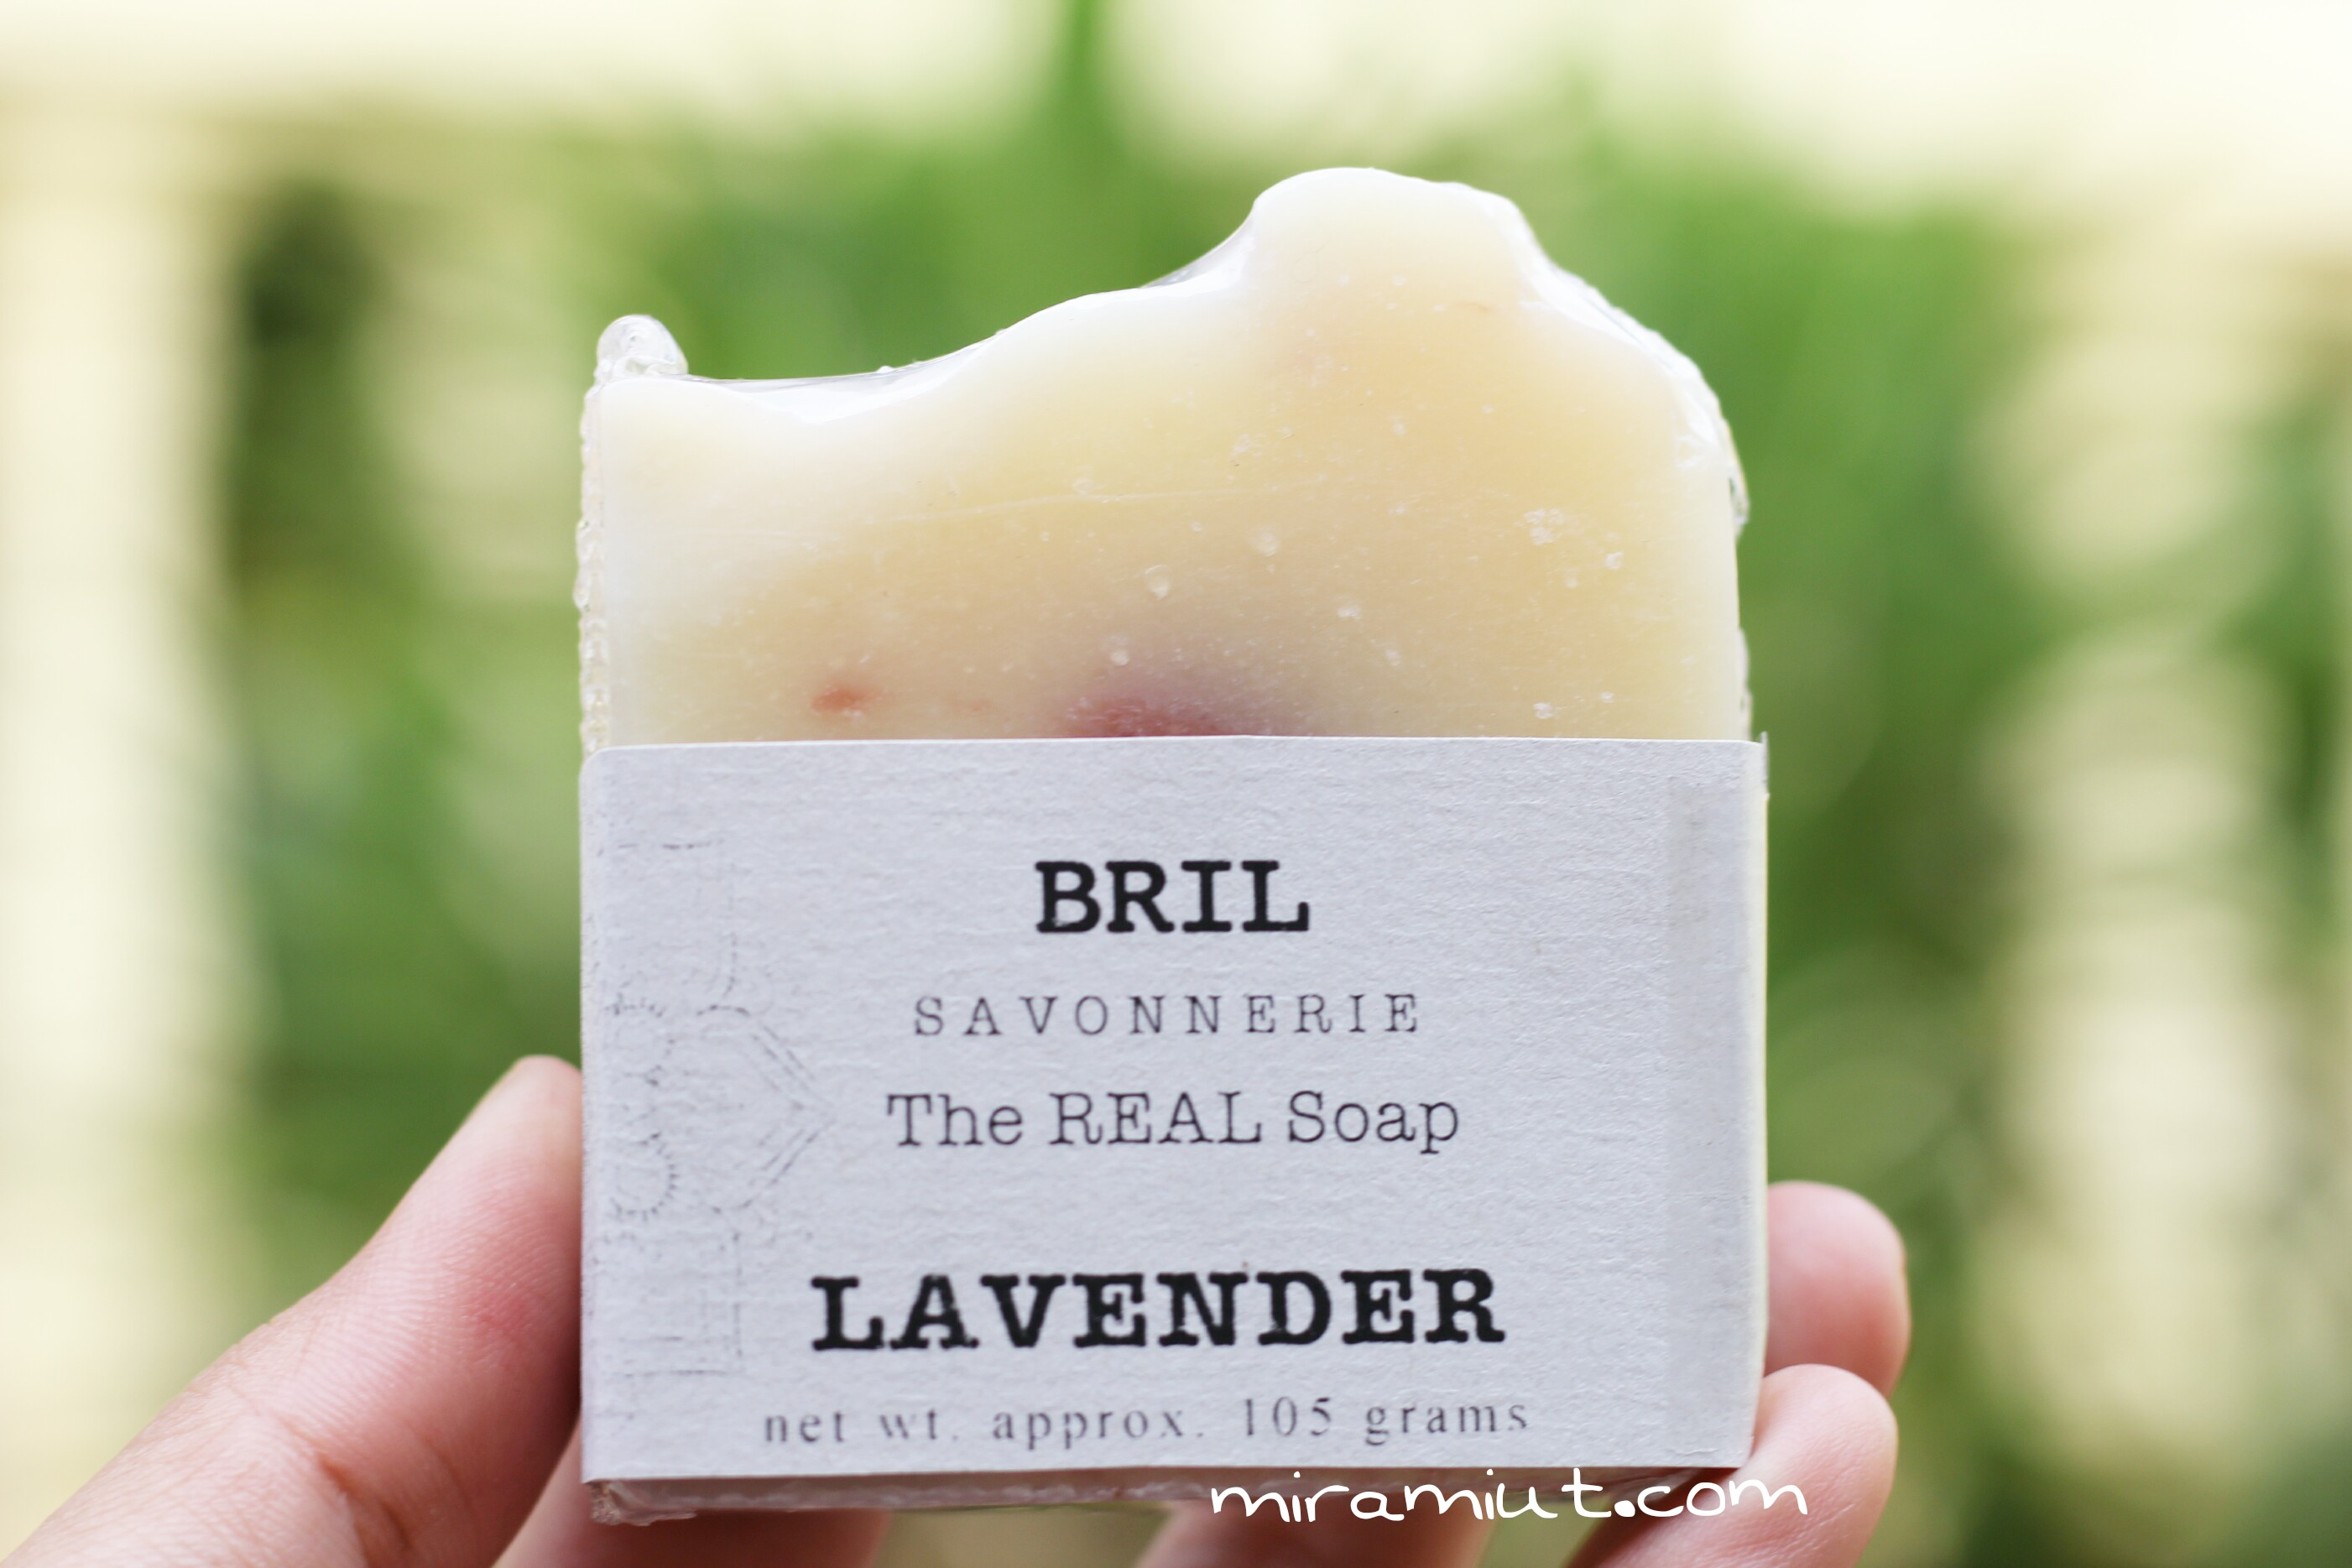 Sabun organik lavender bril savonnerie